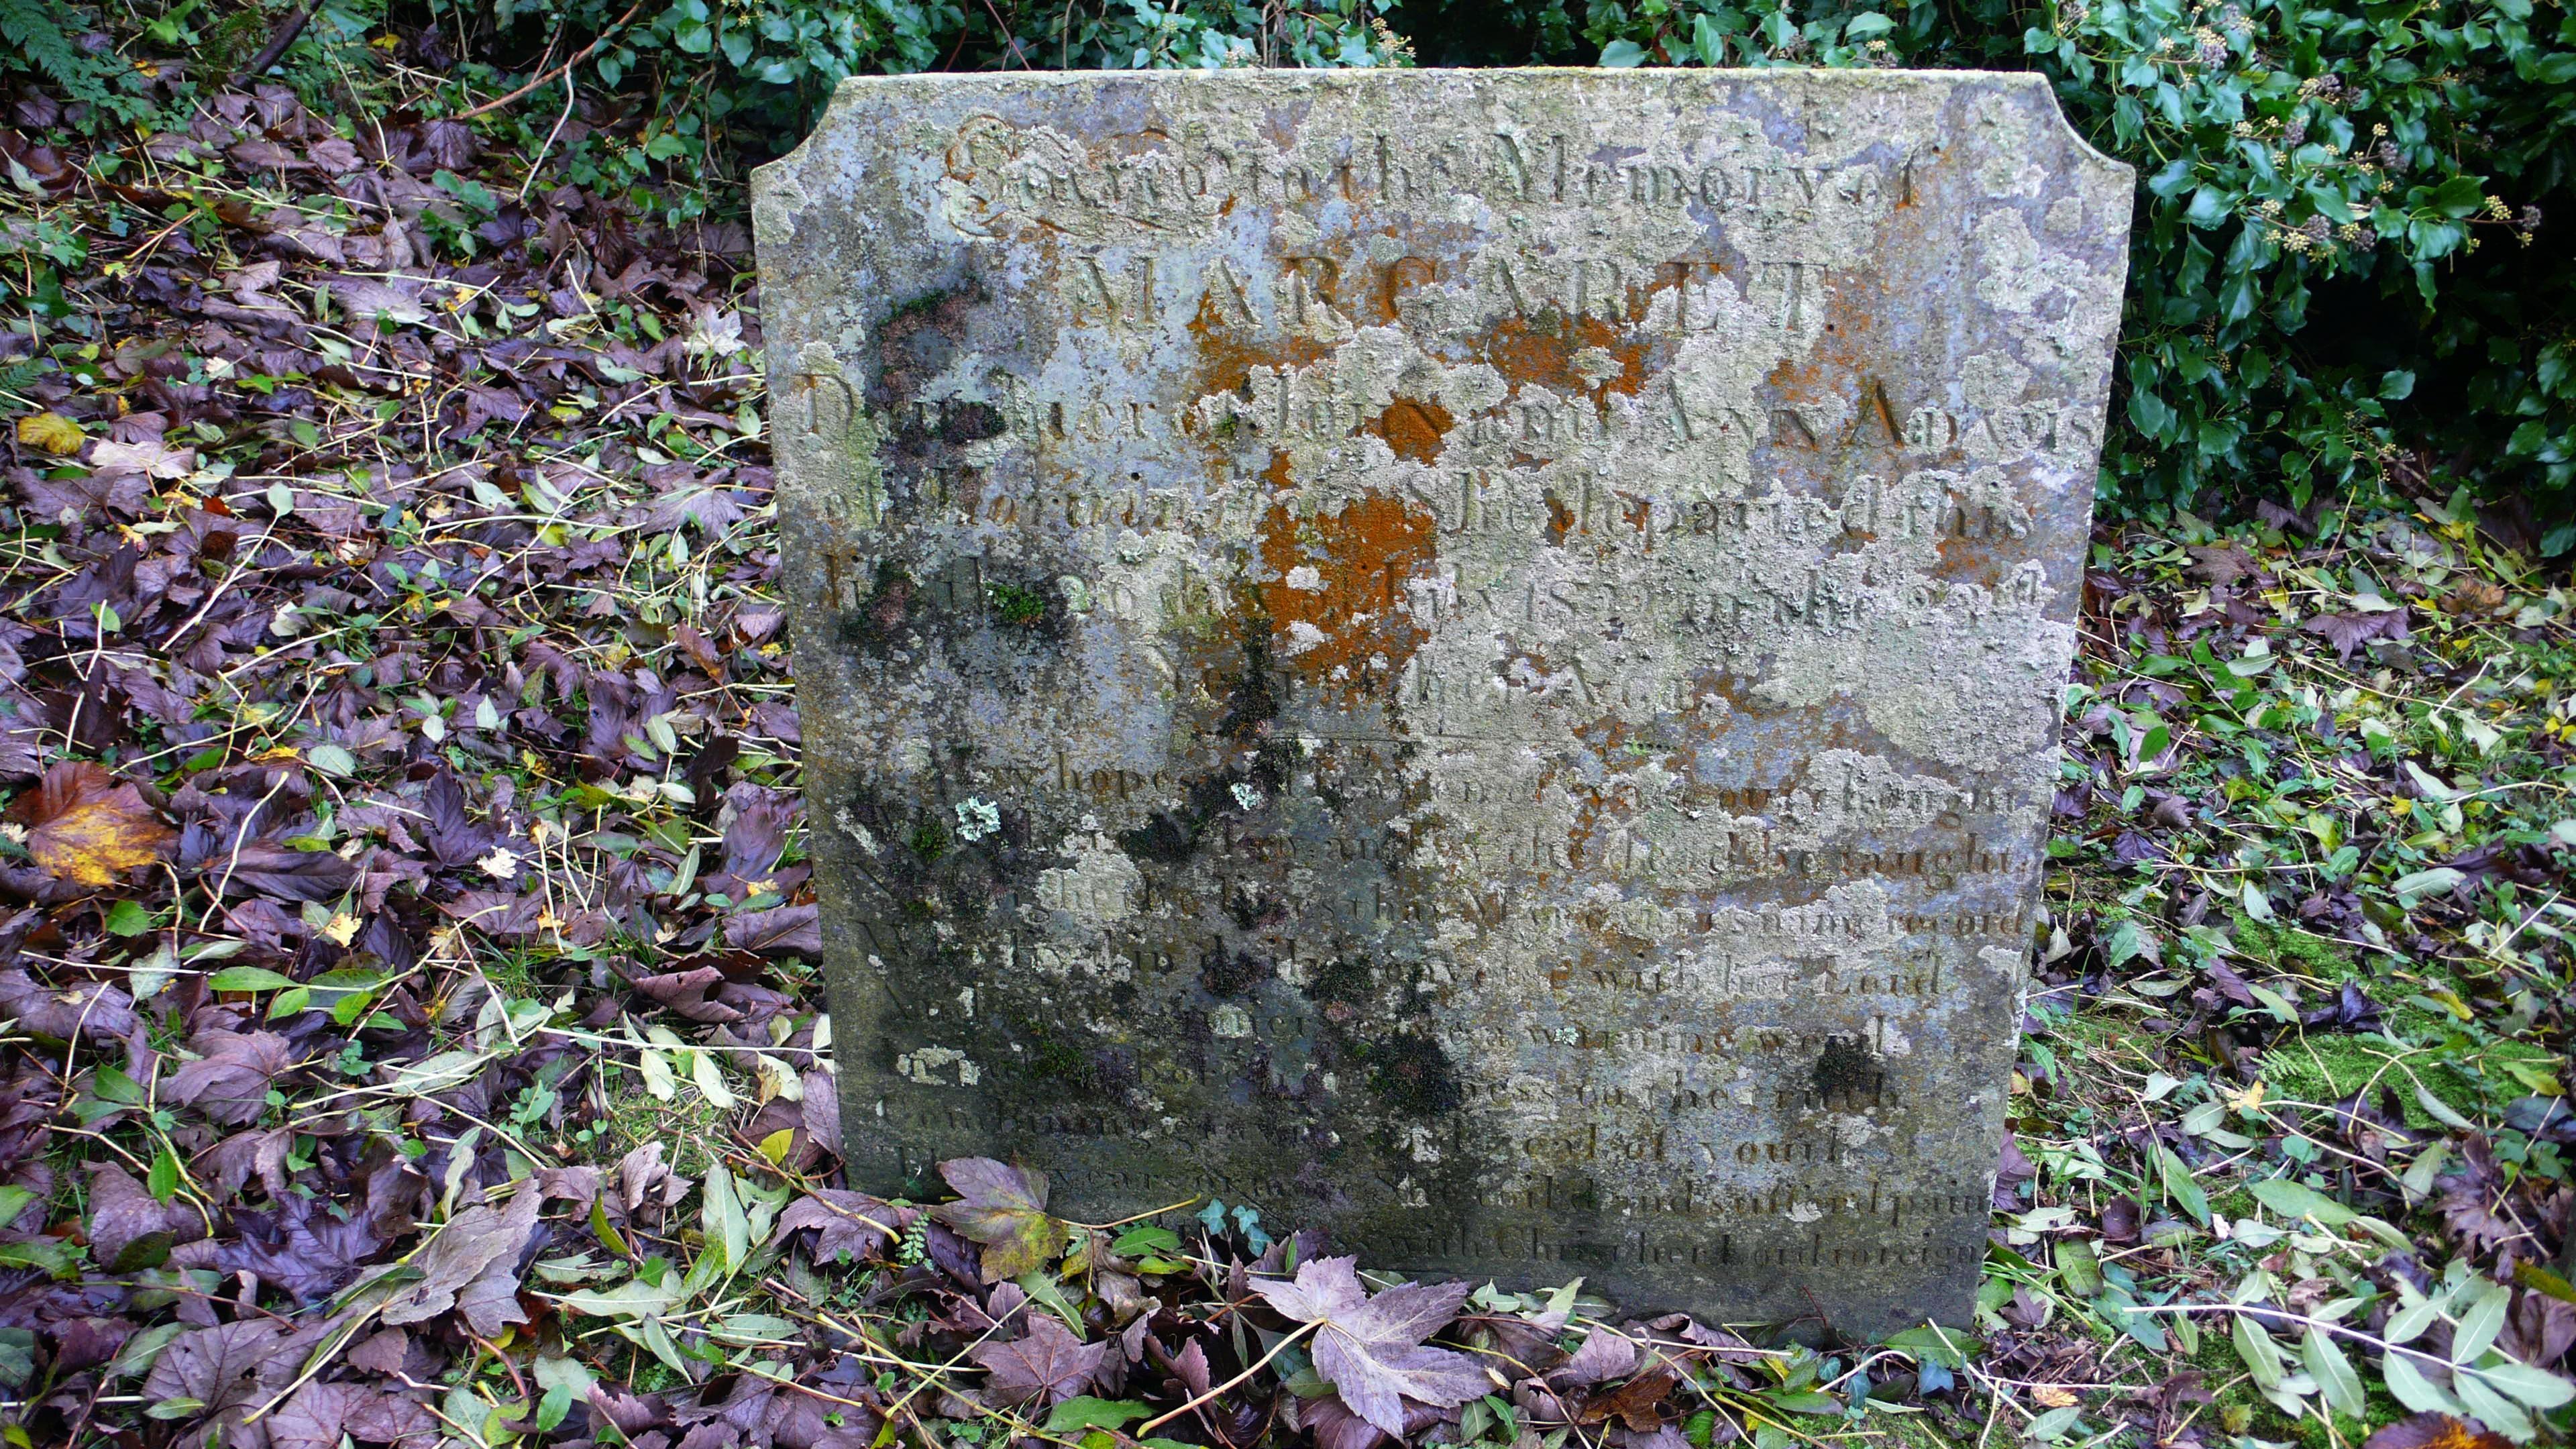 Tombstone at Edistone Chapel - Margaret Adams (1799-1822)